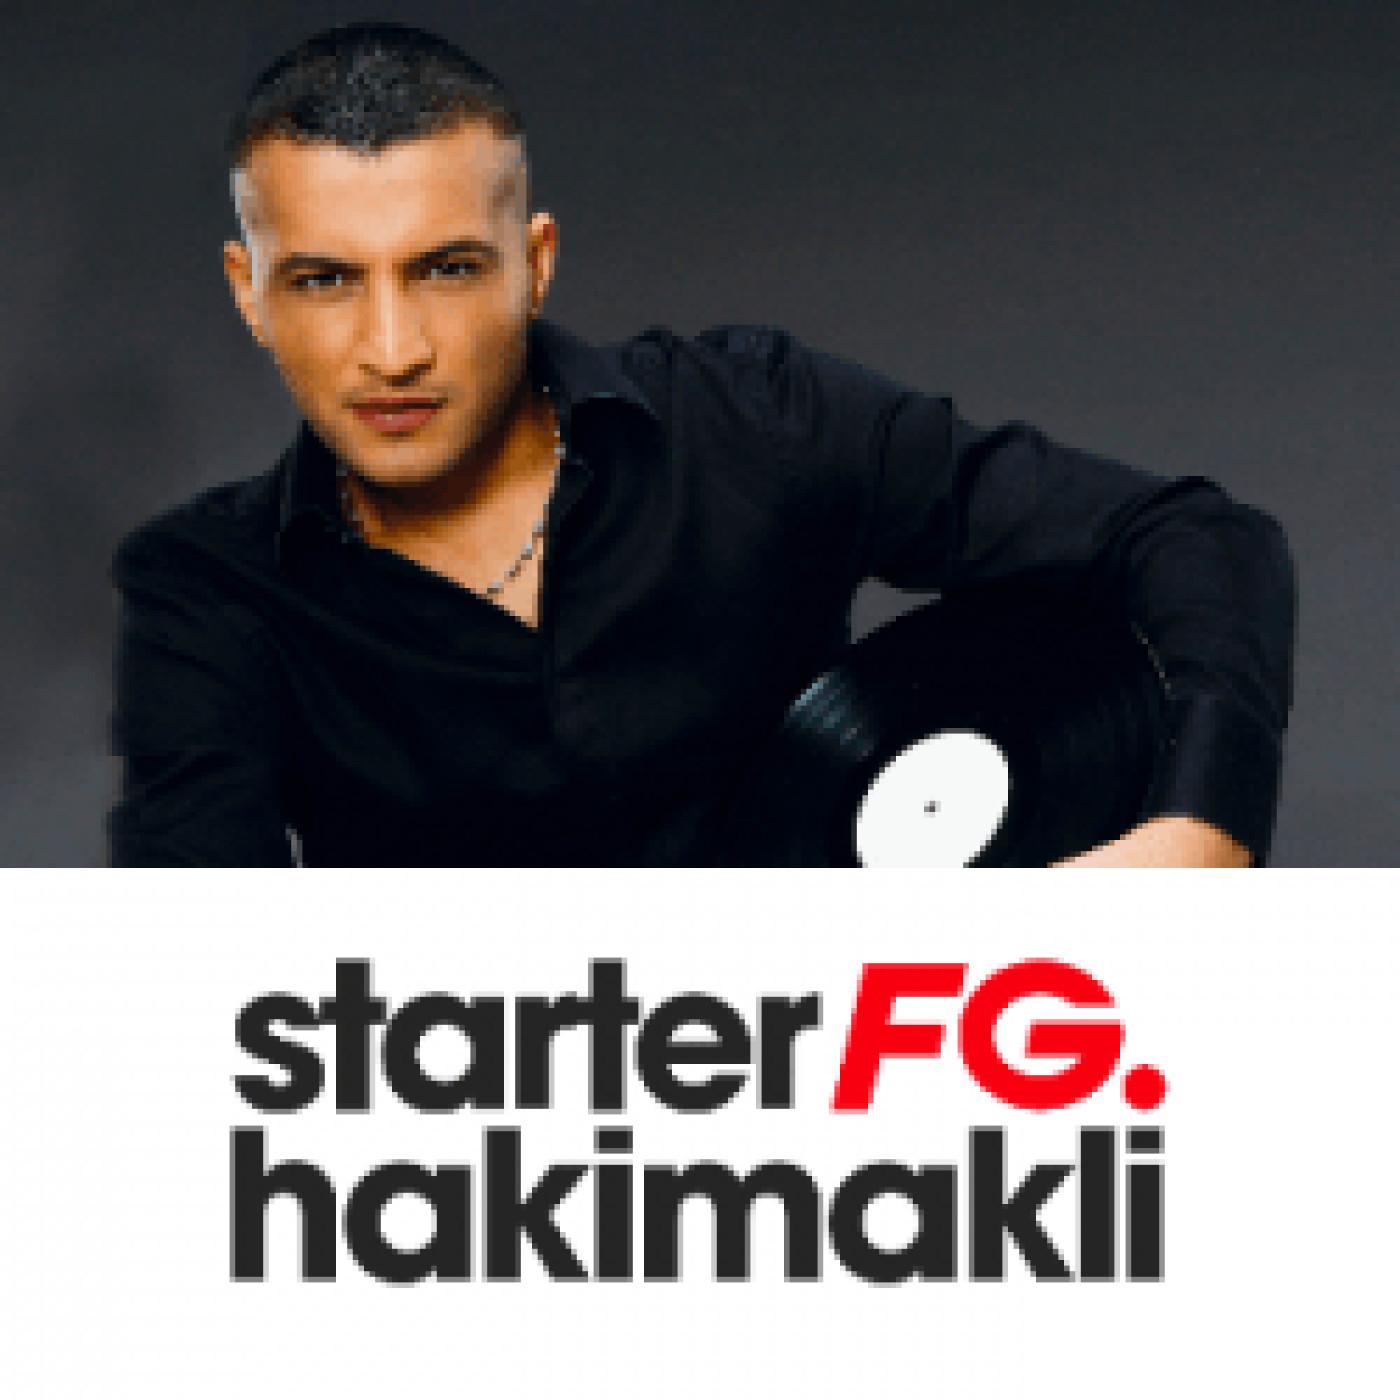 STARTER FG BY HAKIMAKLI MERCREDI 30 DECEMBRE 2020